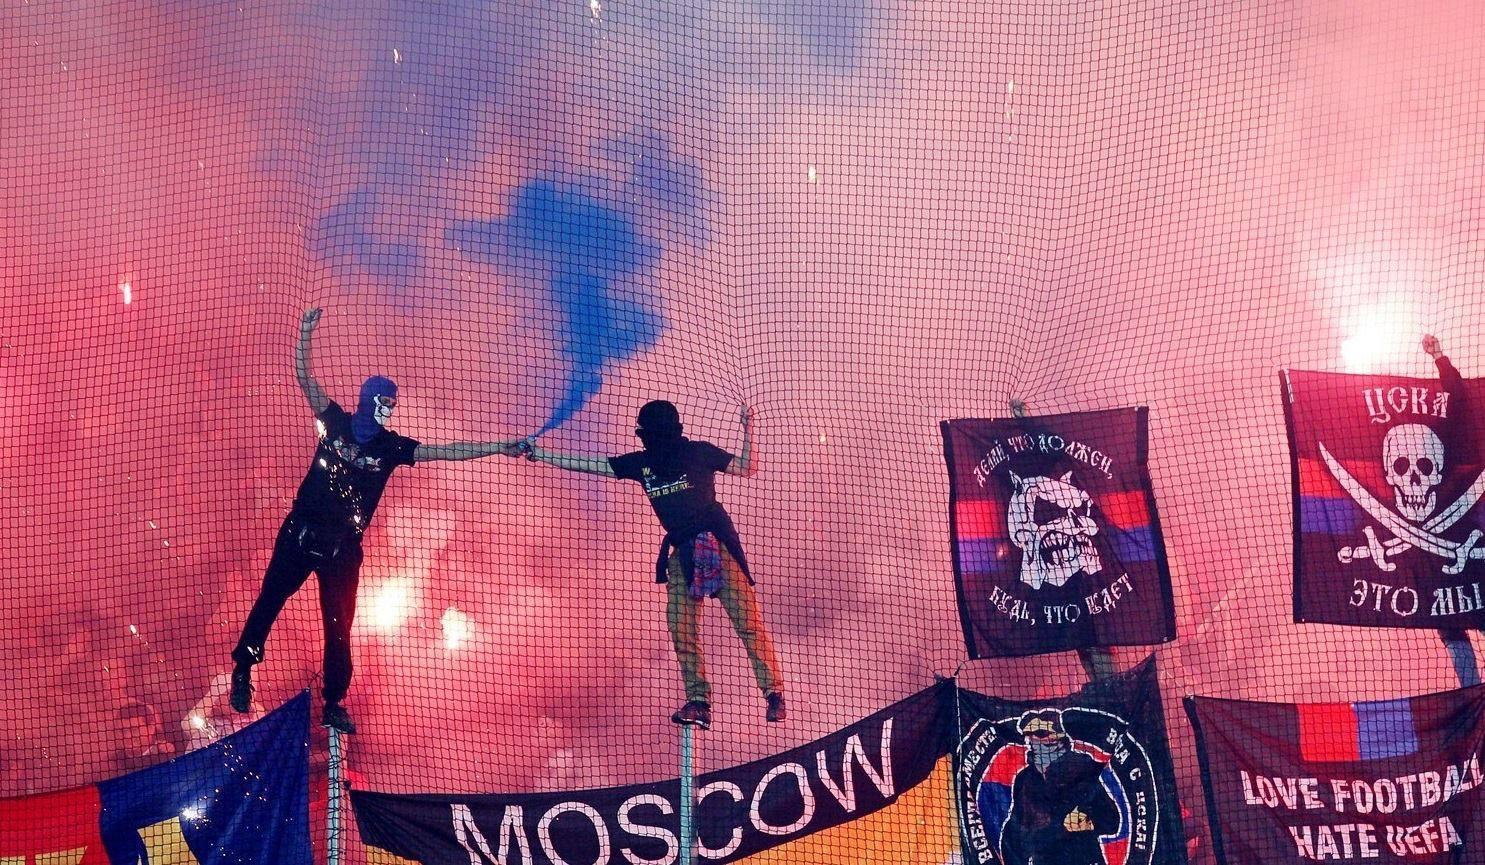 CSKA Moscow – CSKA Fans Against Racism